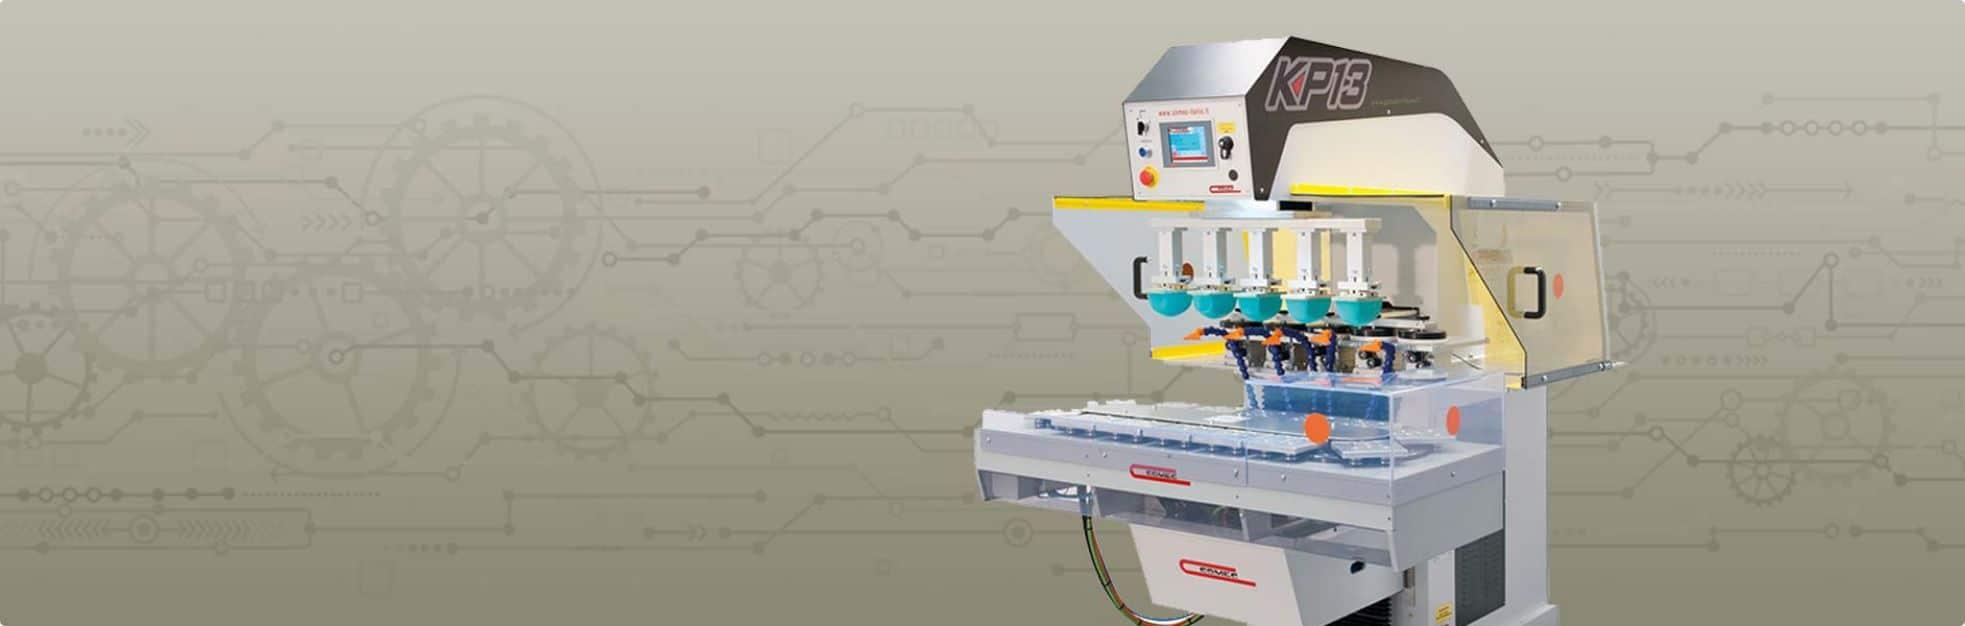 KP13 electro-pneumatic Printer